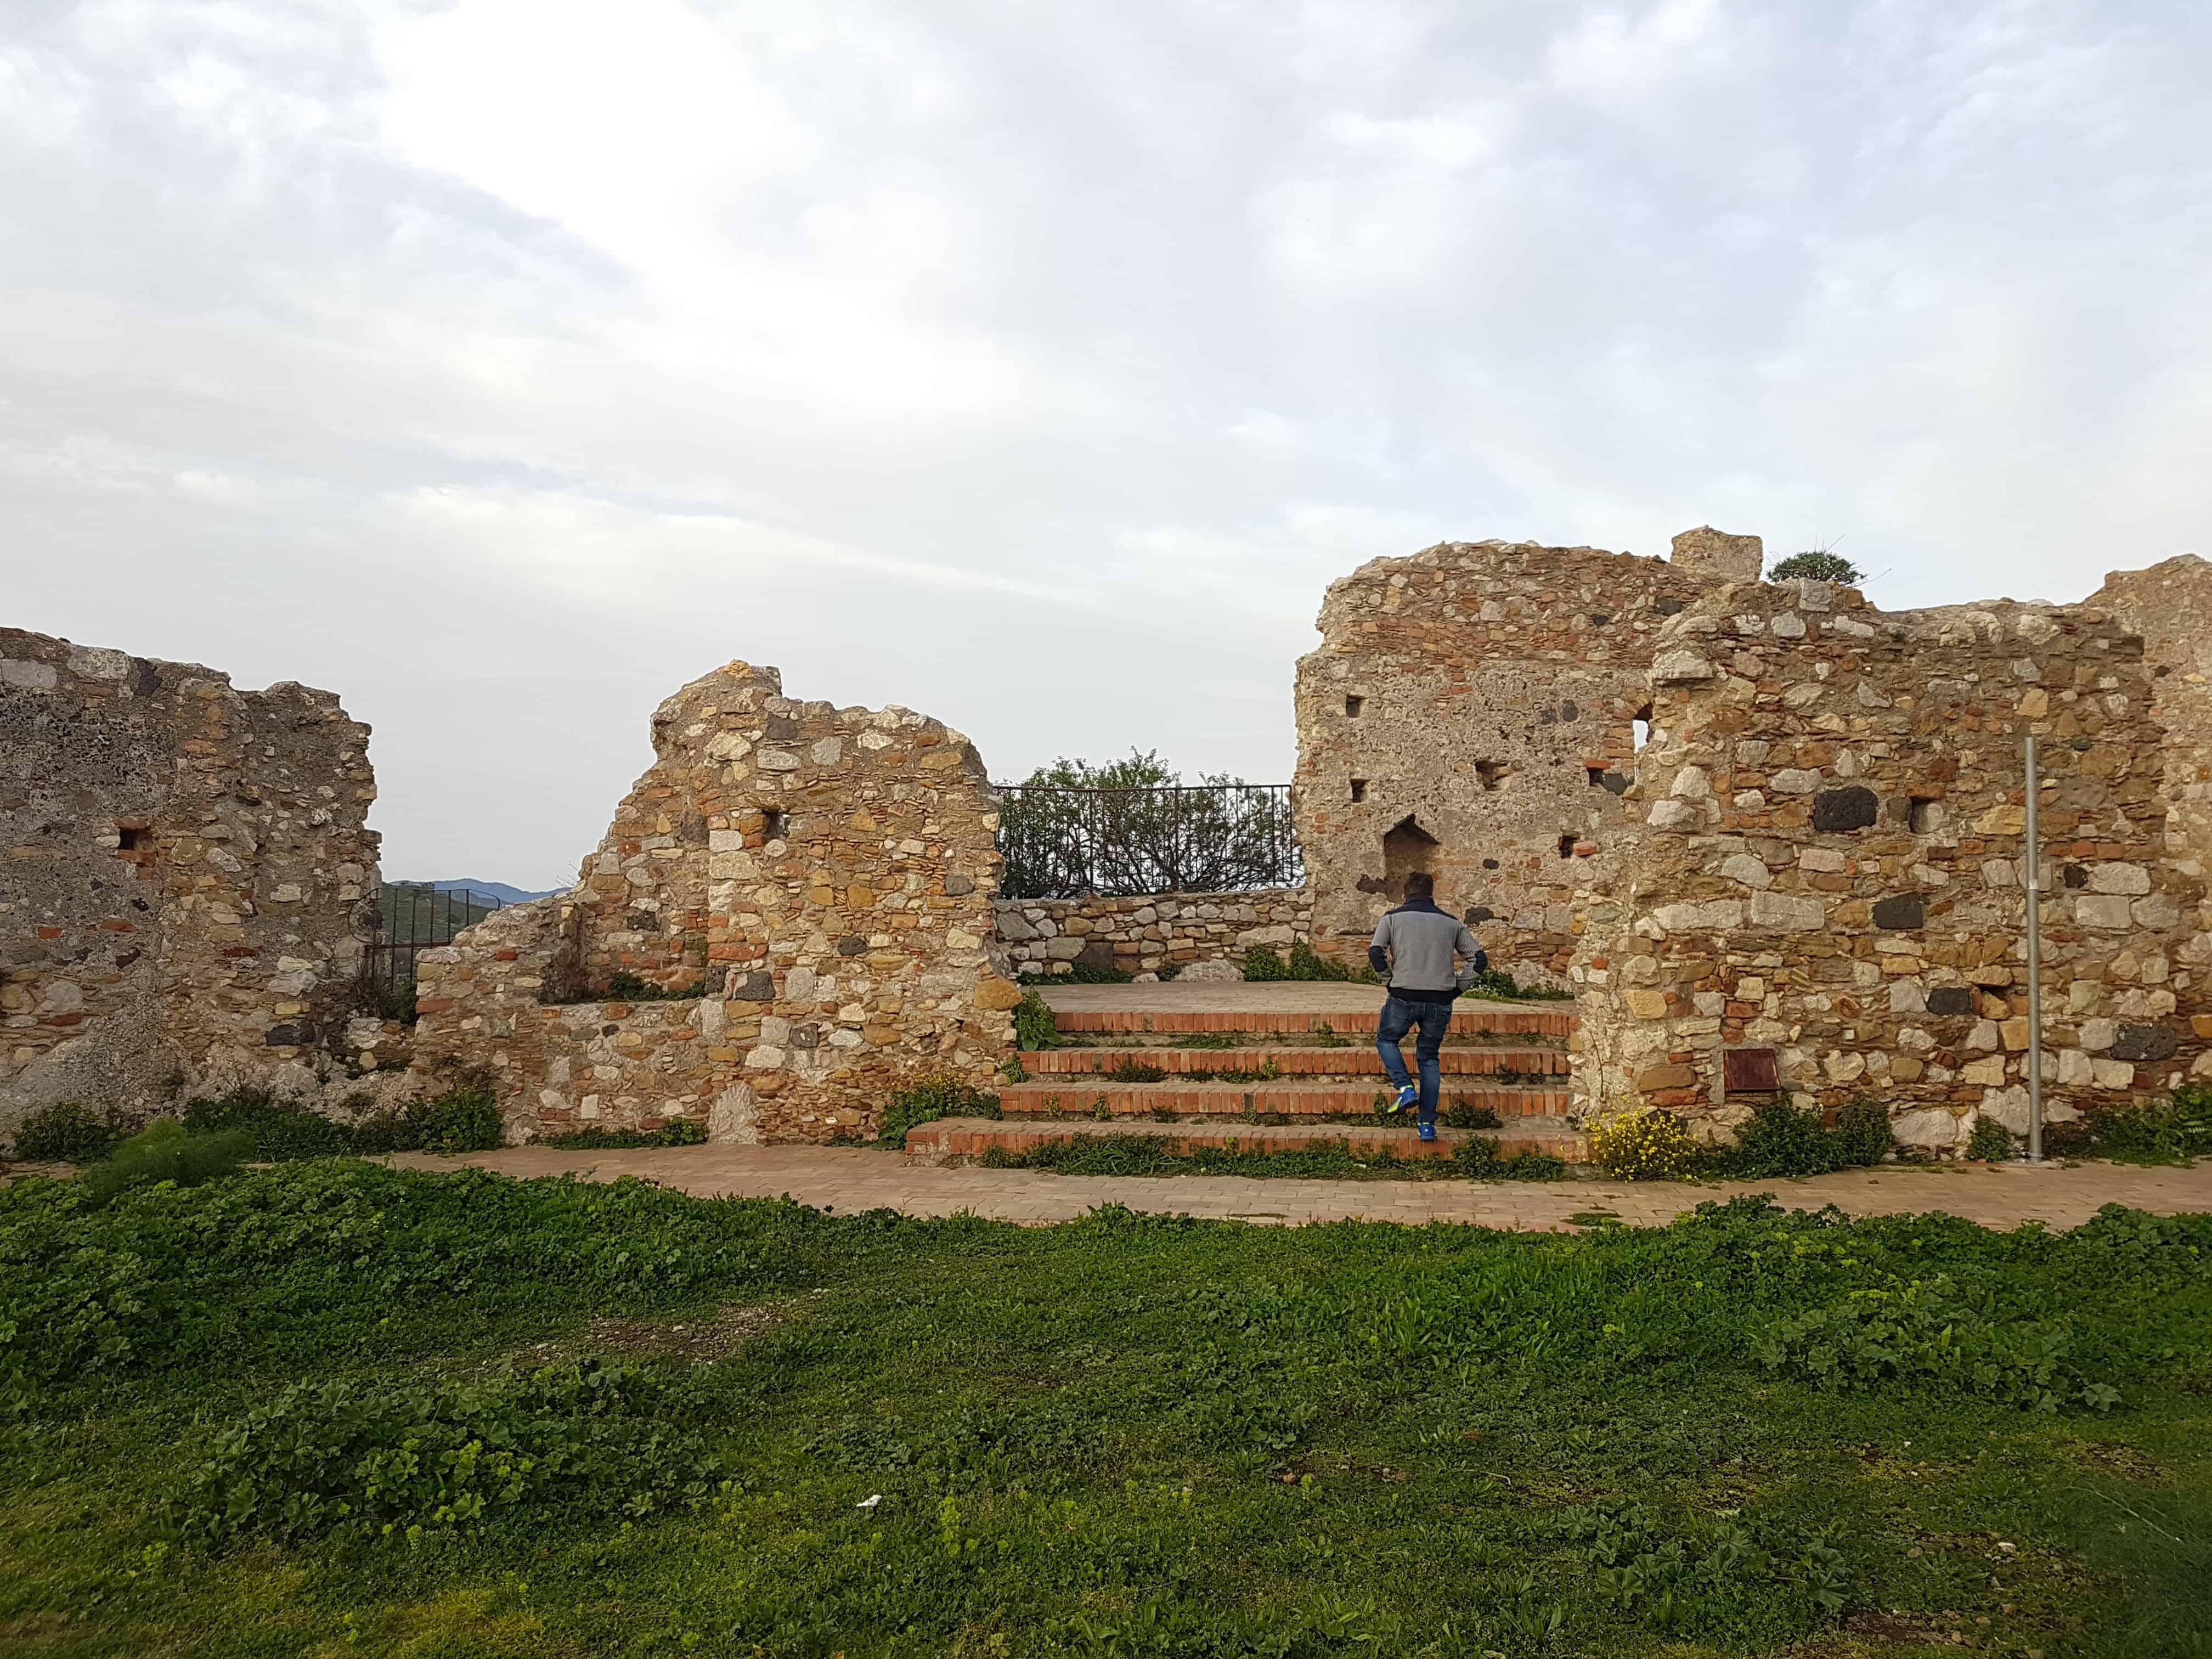 Kasteel resten Castelmolo